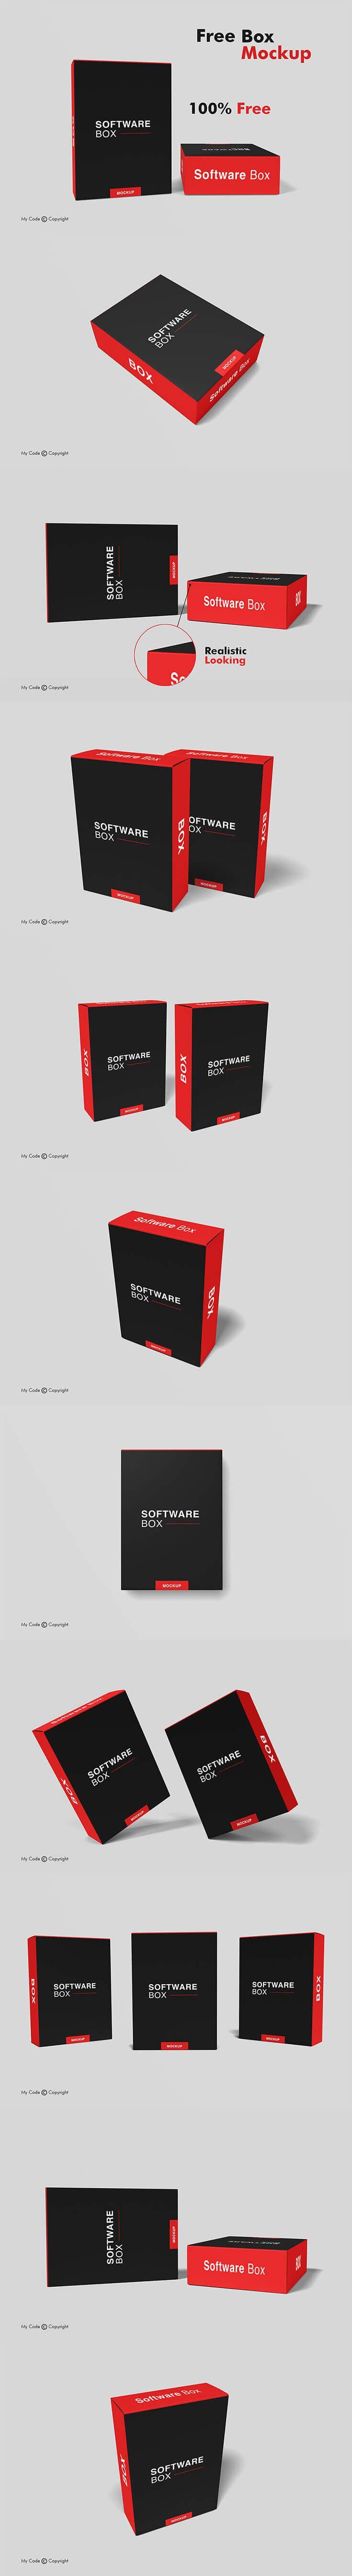 11112+ Box Mockup Software Best Free Mockups